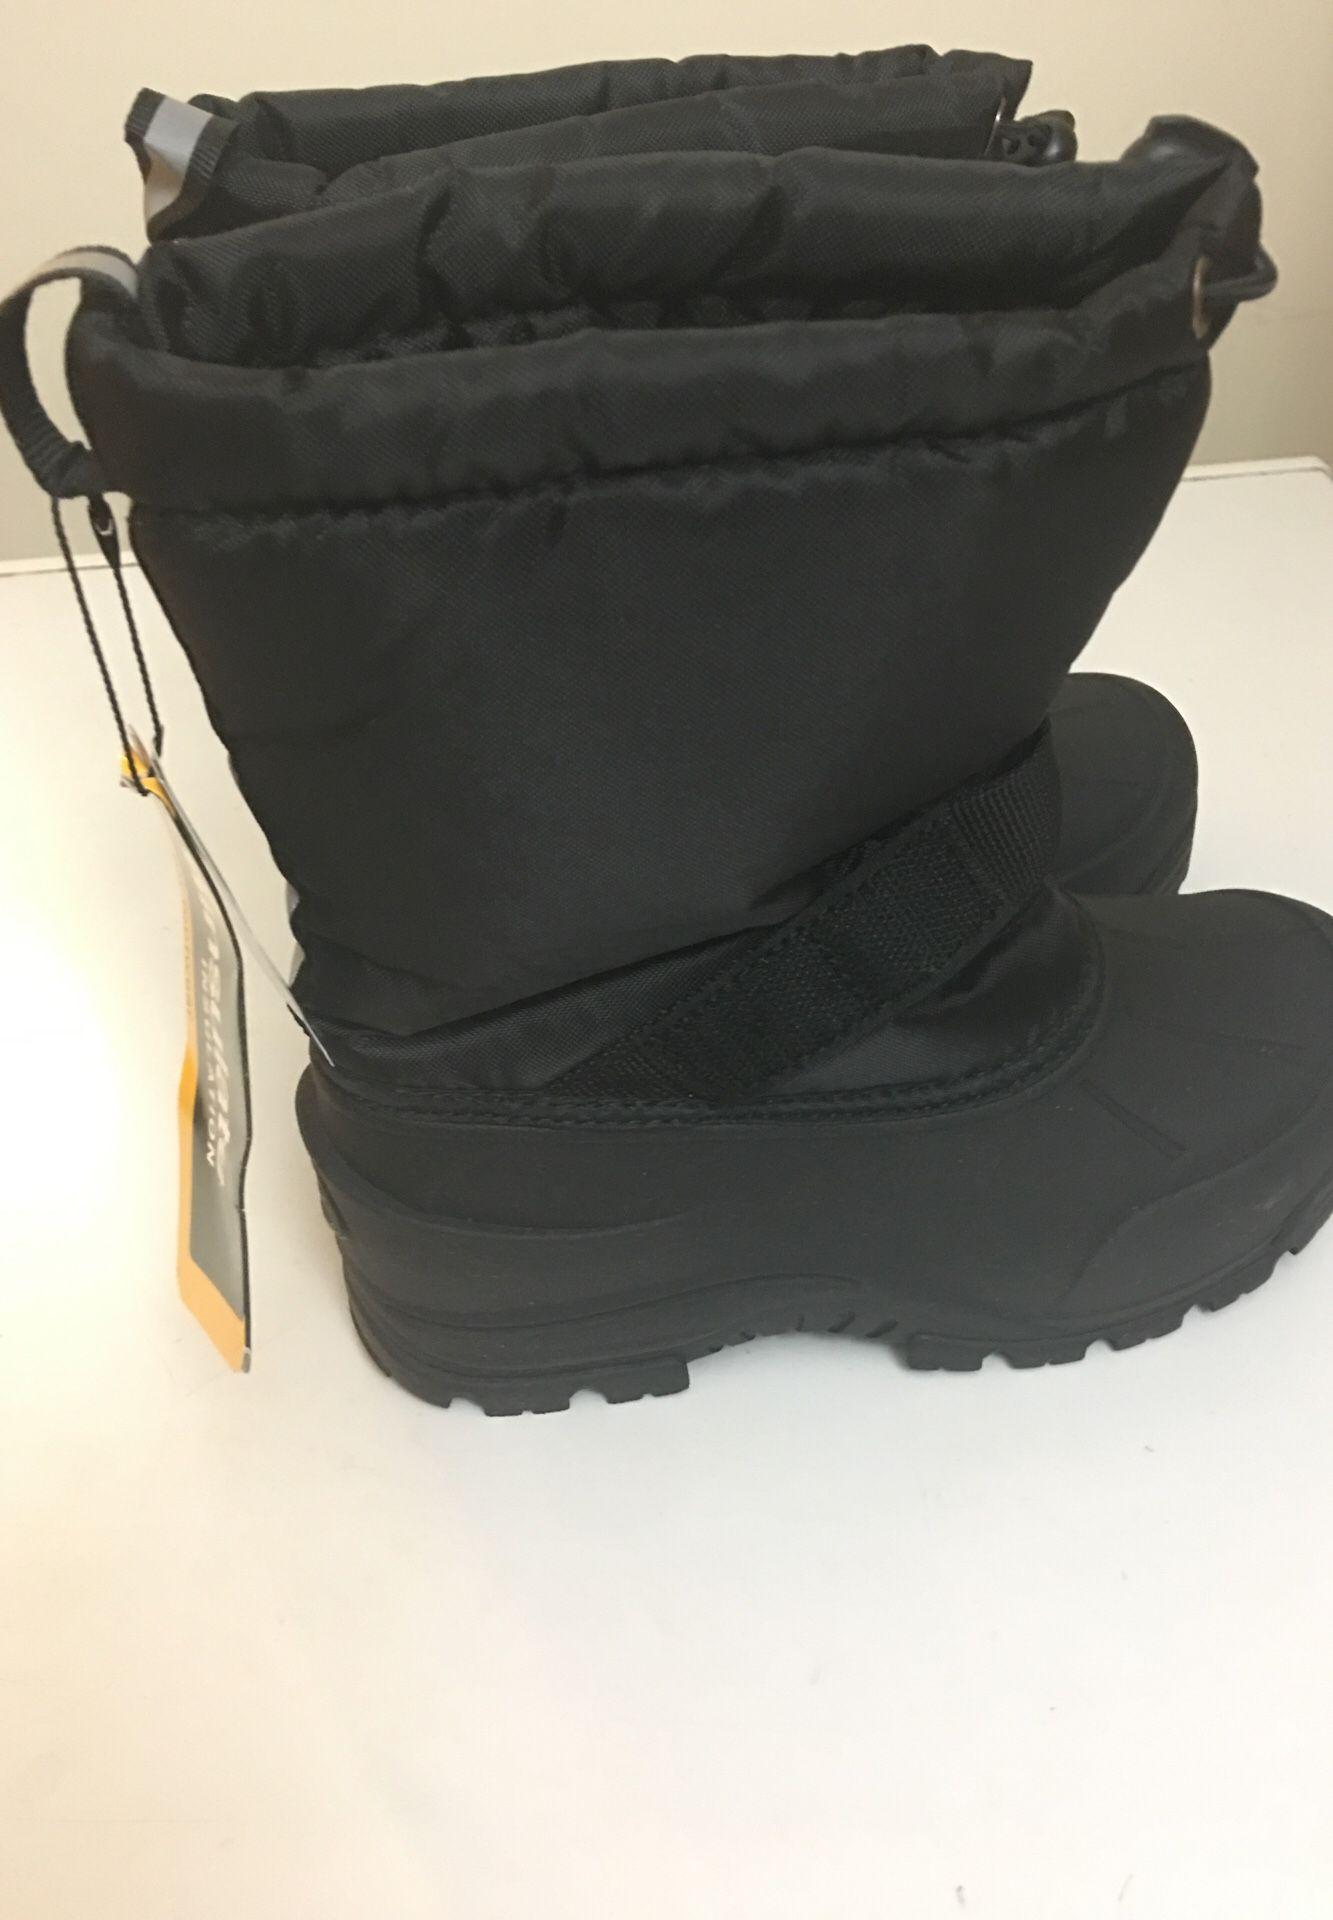 Northside 33 Boys Girls Toddler/Little Kids/Big Kids Frosty Winter Snow Boot …